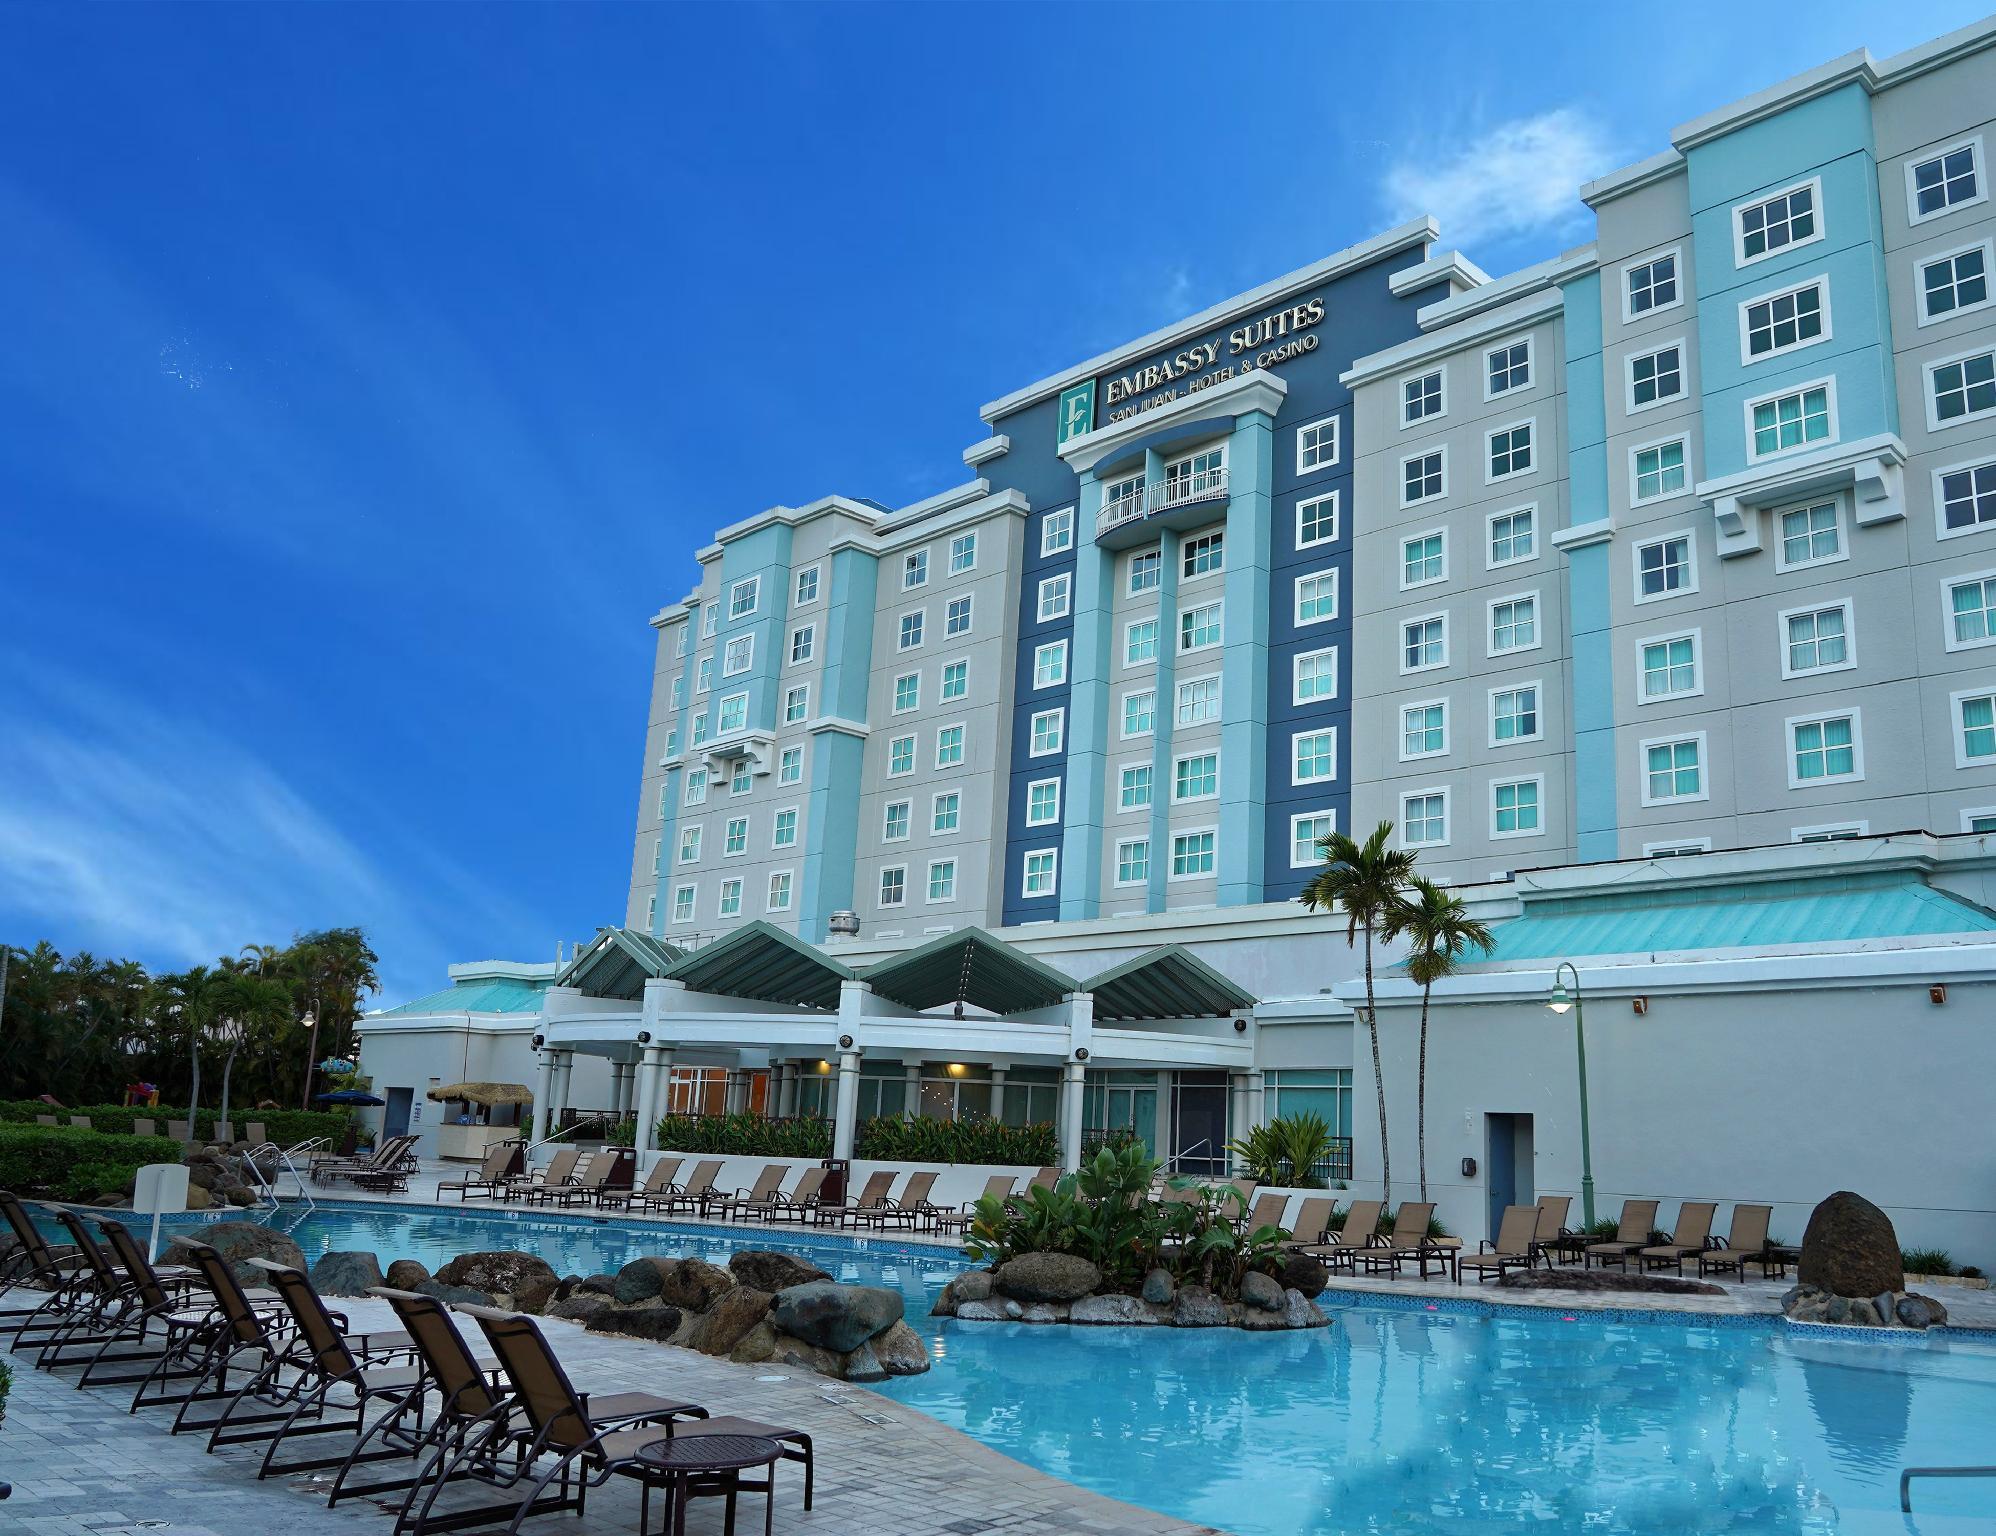 Embassy Suites Hotel San Juan Hotel & Casino